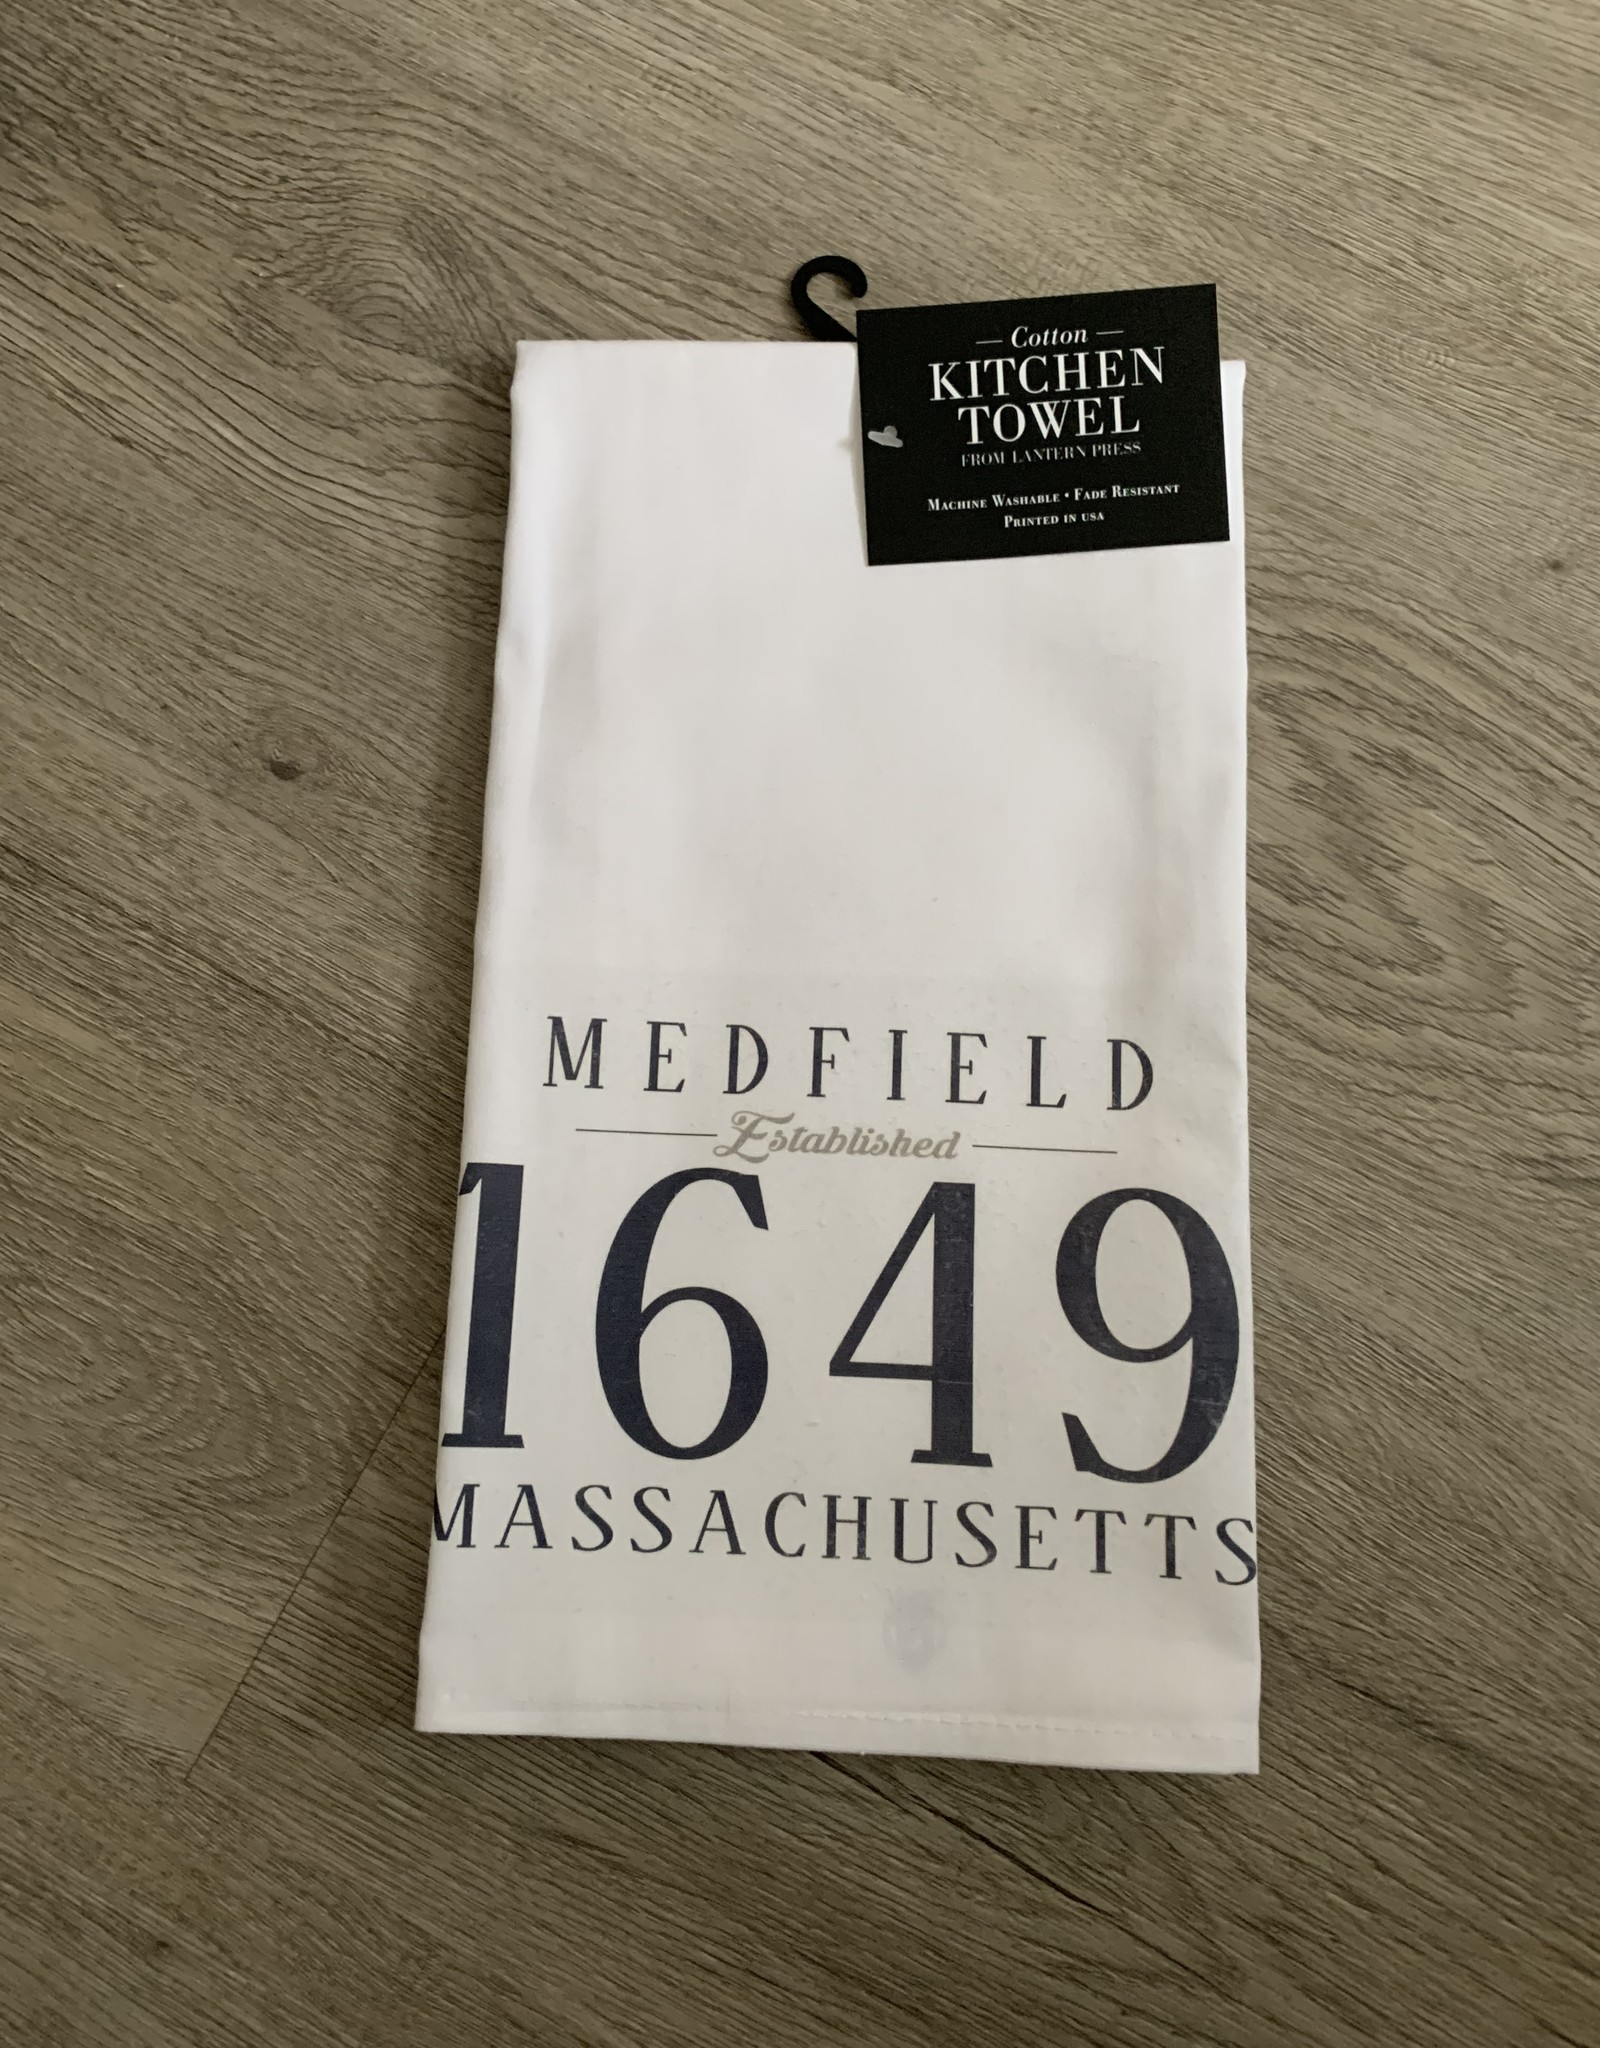 Lantern Press - EST Medfield Kitchen Towel